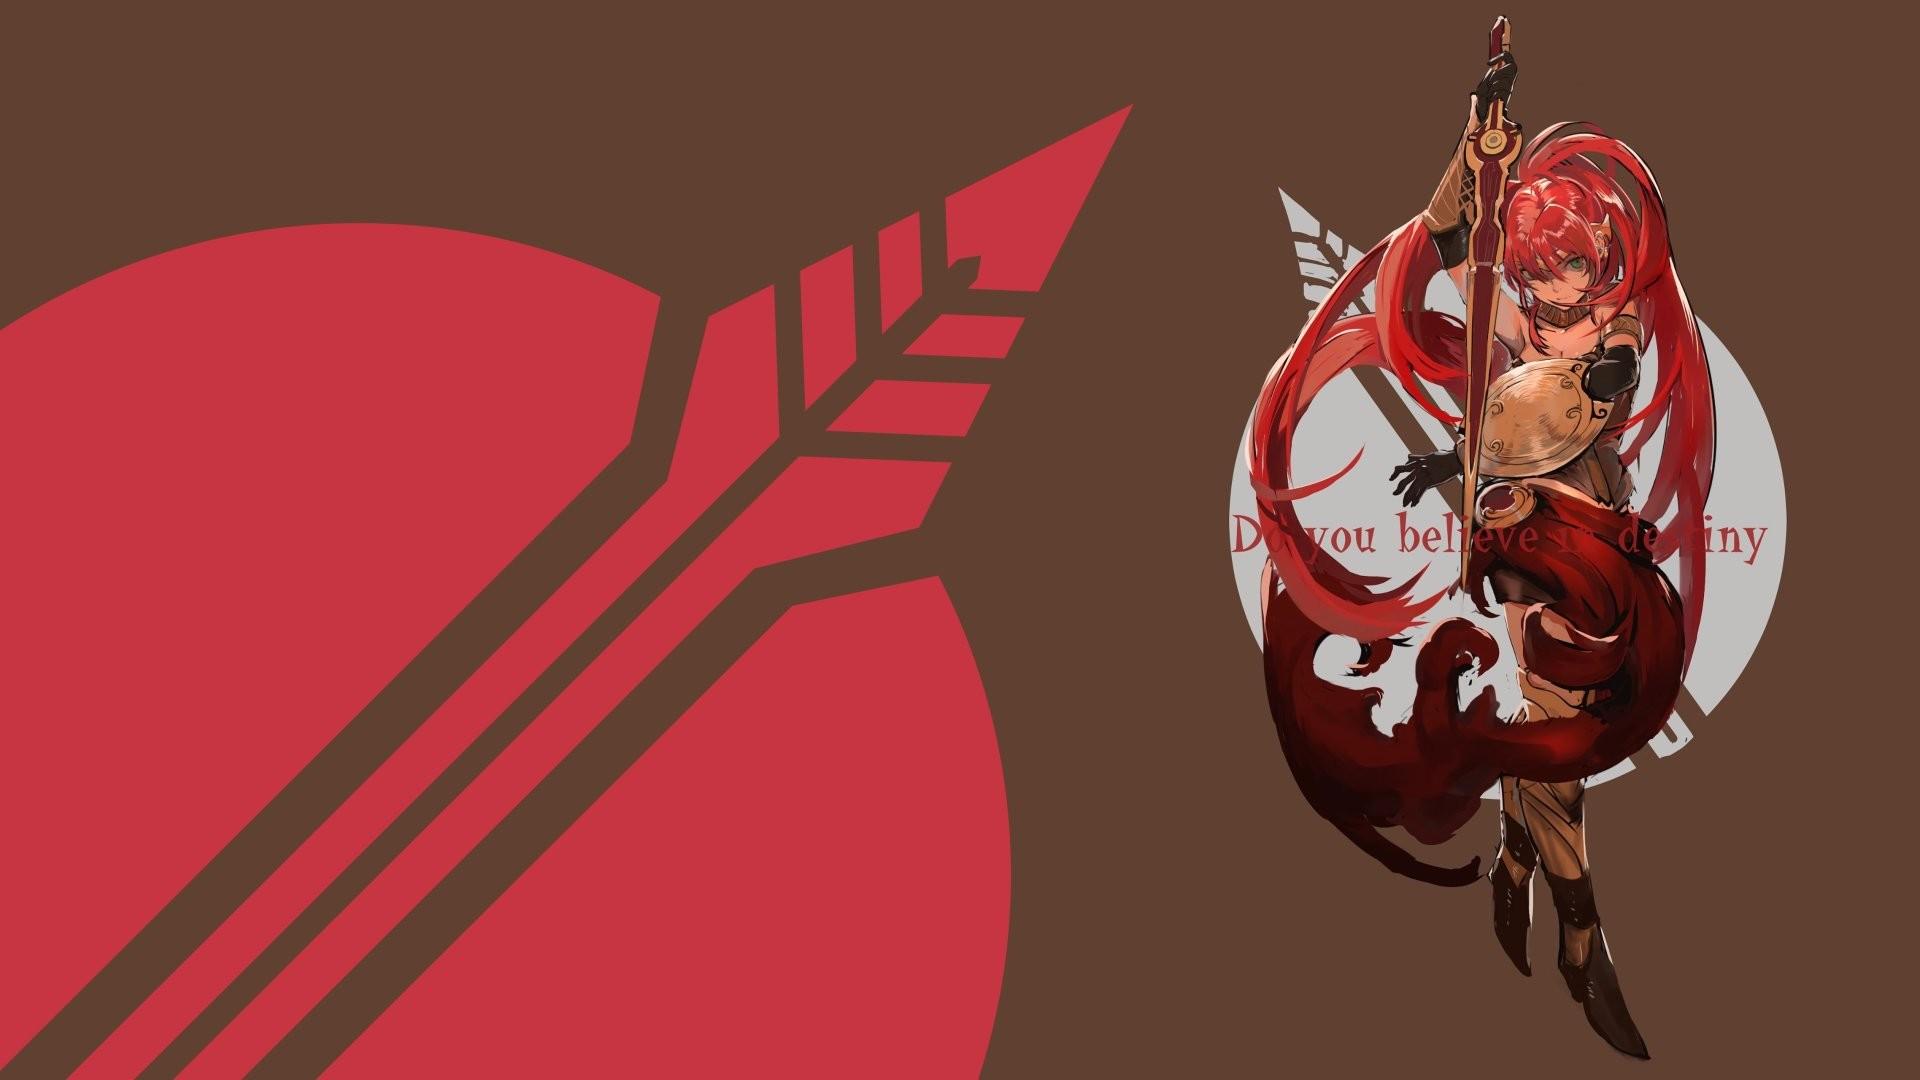 Anime – RWBY Pyrrha Nikos Wallpaper